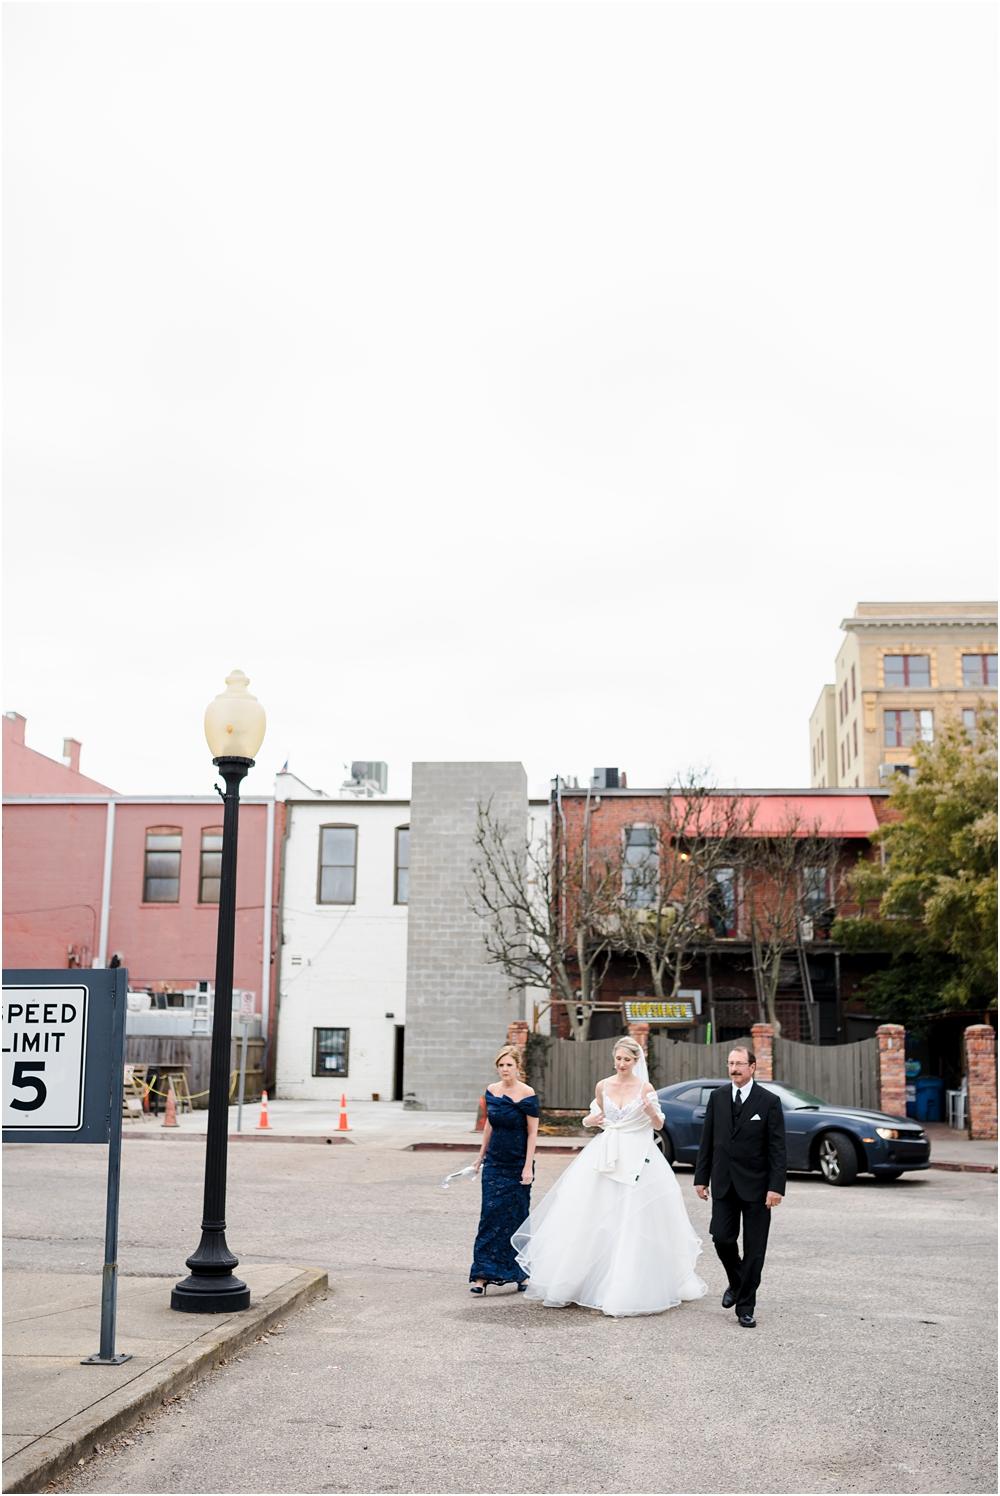 oconnor-pensacola-florida-wedding-photographer-kiersten-taylor-35.jpg